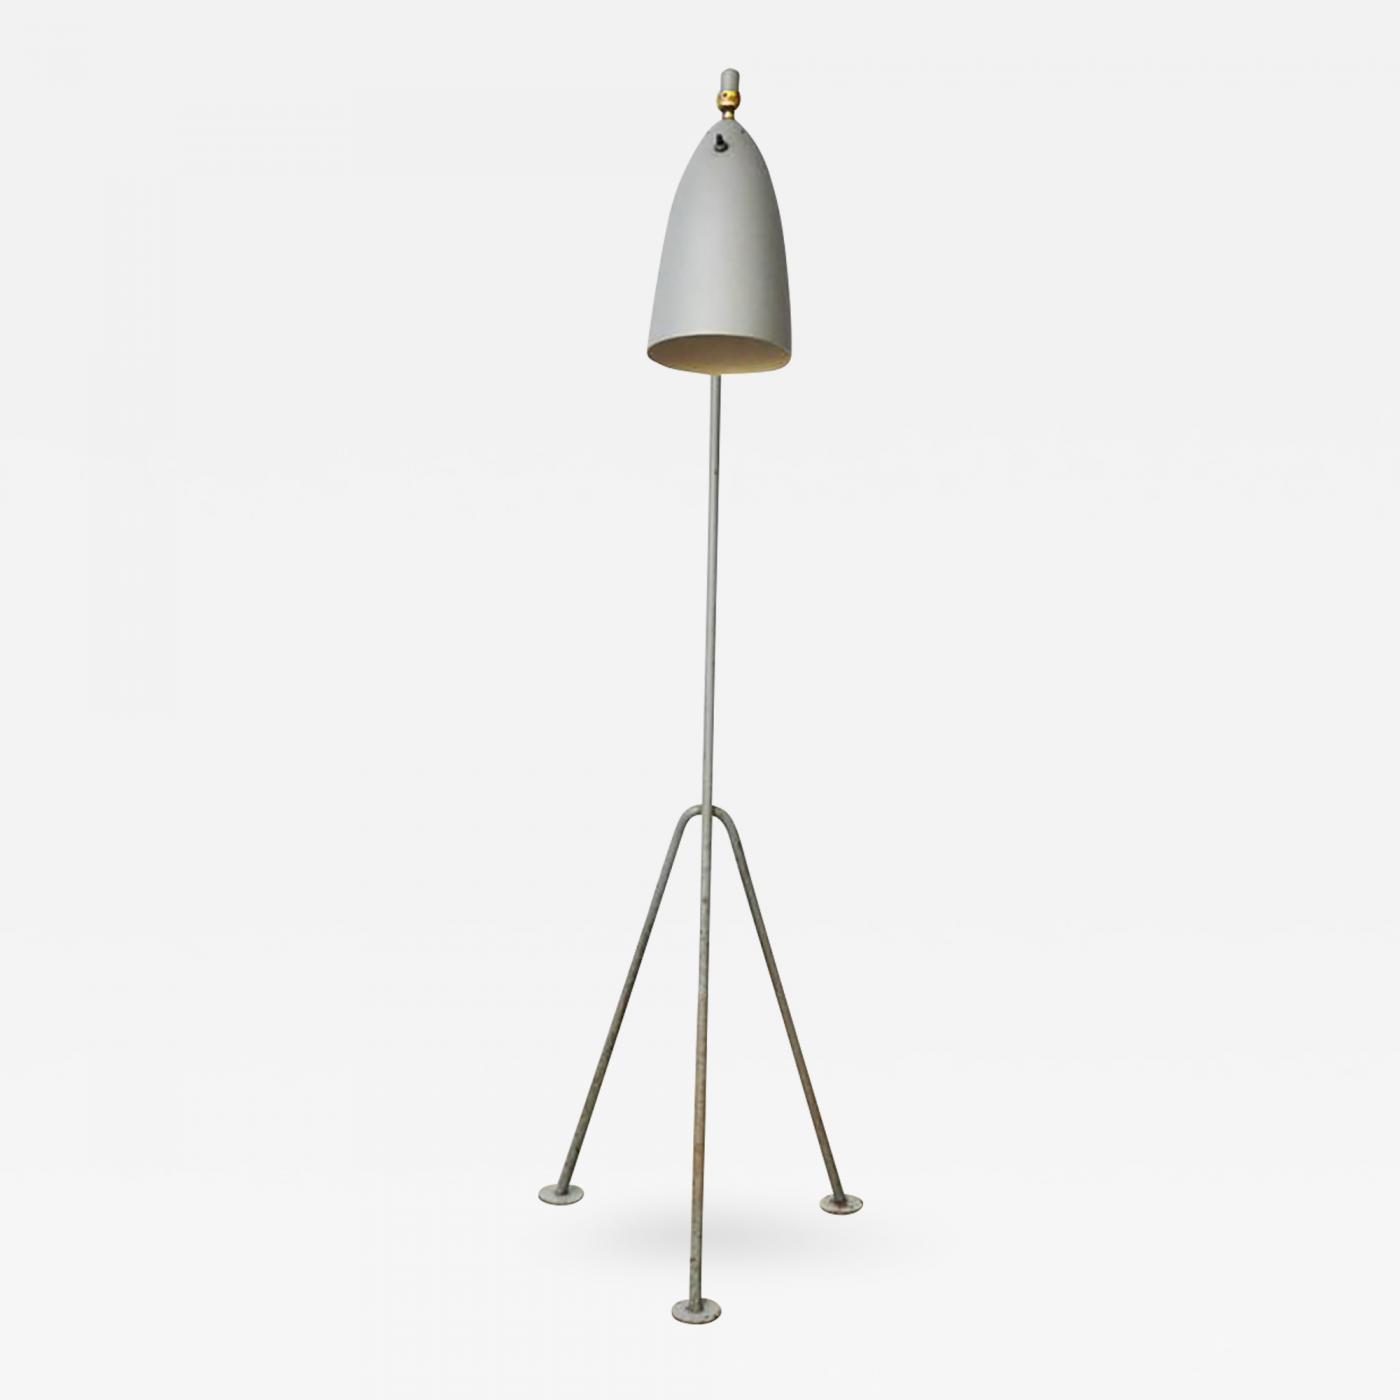 Greta Magnusson Grossman Greta Grossman 831 Grasshopper Floor Lamp For Ralph O Smith